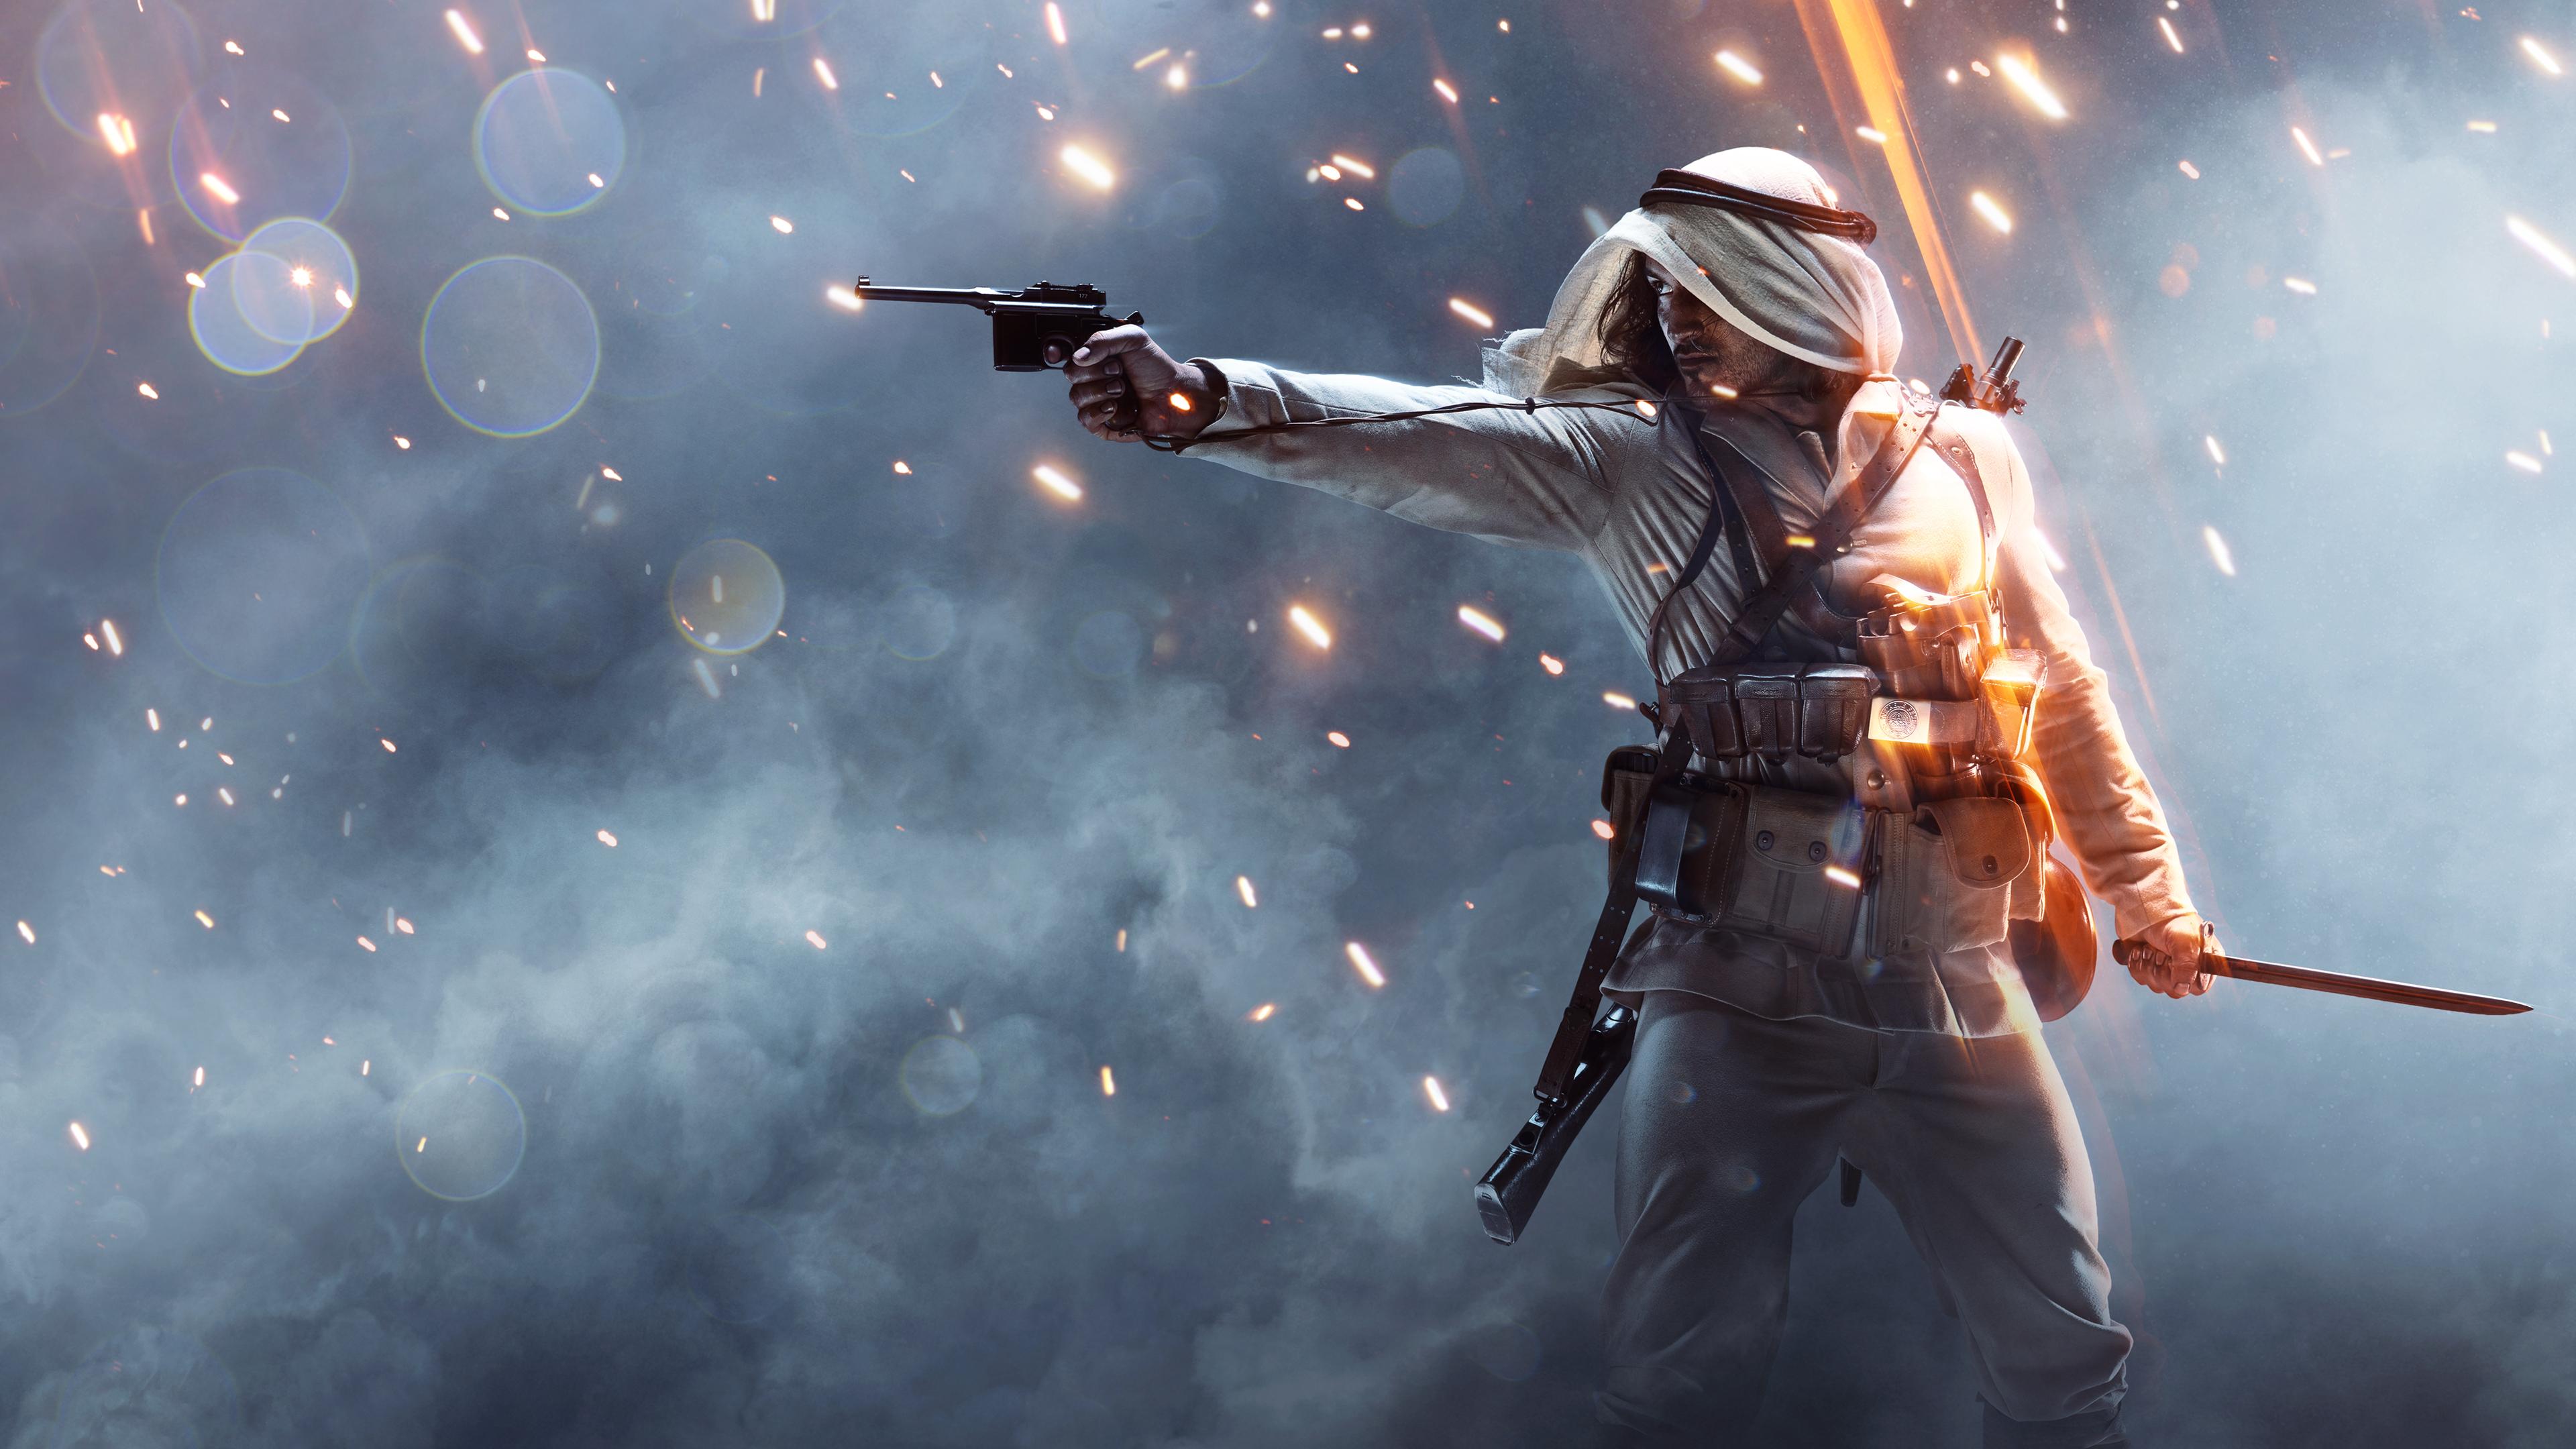 Battlefield 1 4k 2018, HD Games, 4k Wallpapers, Images ...